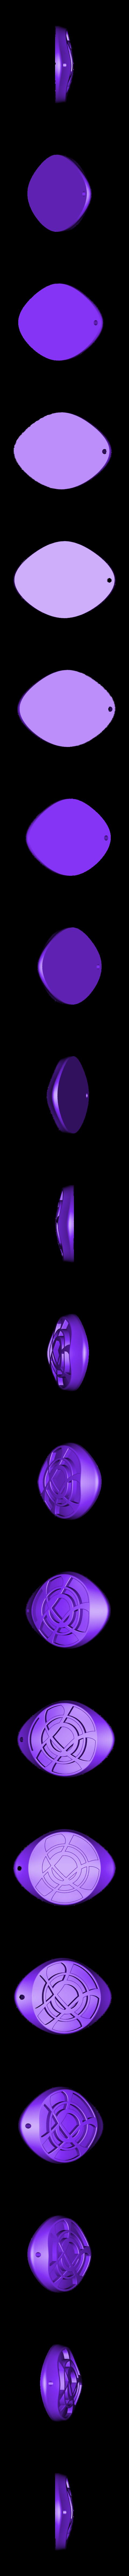 amulette.stl Download STL file pendant amulet • 3D printer design, david39